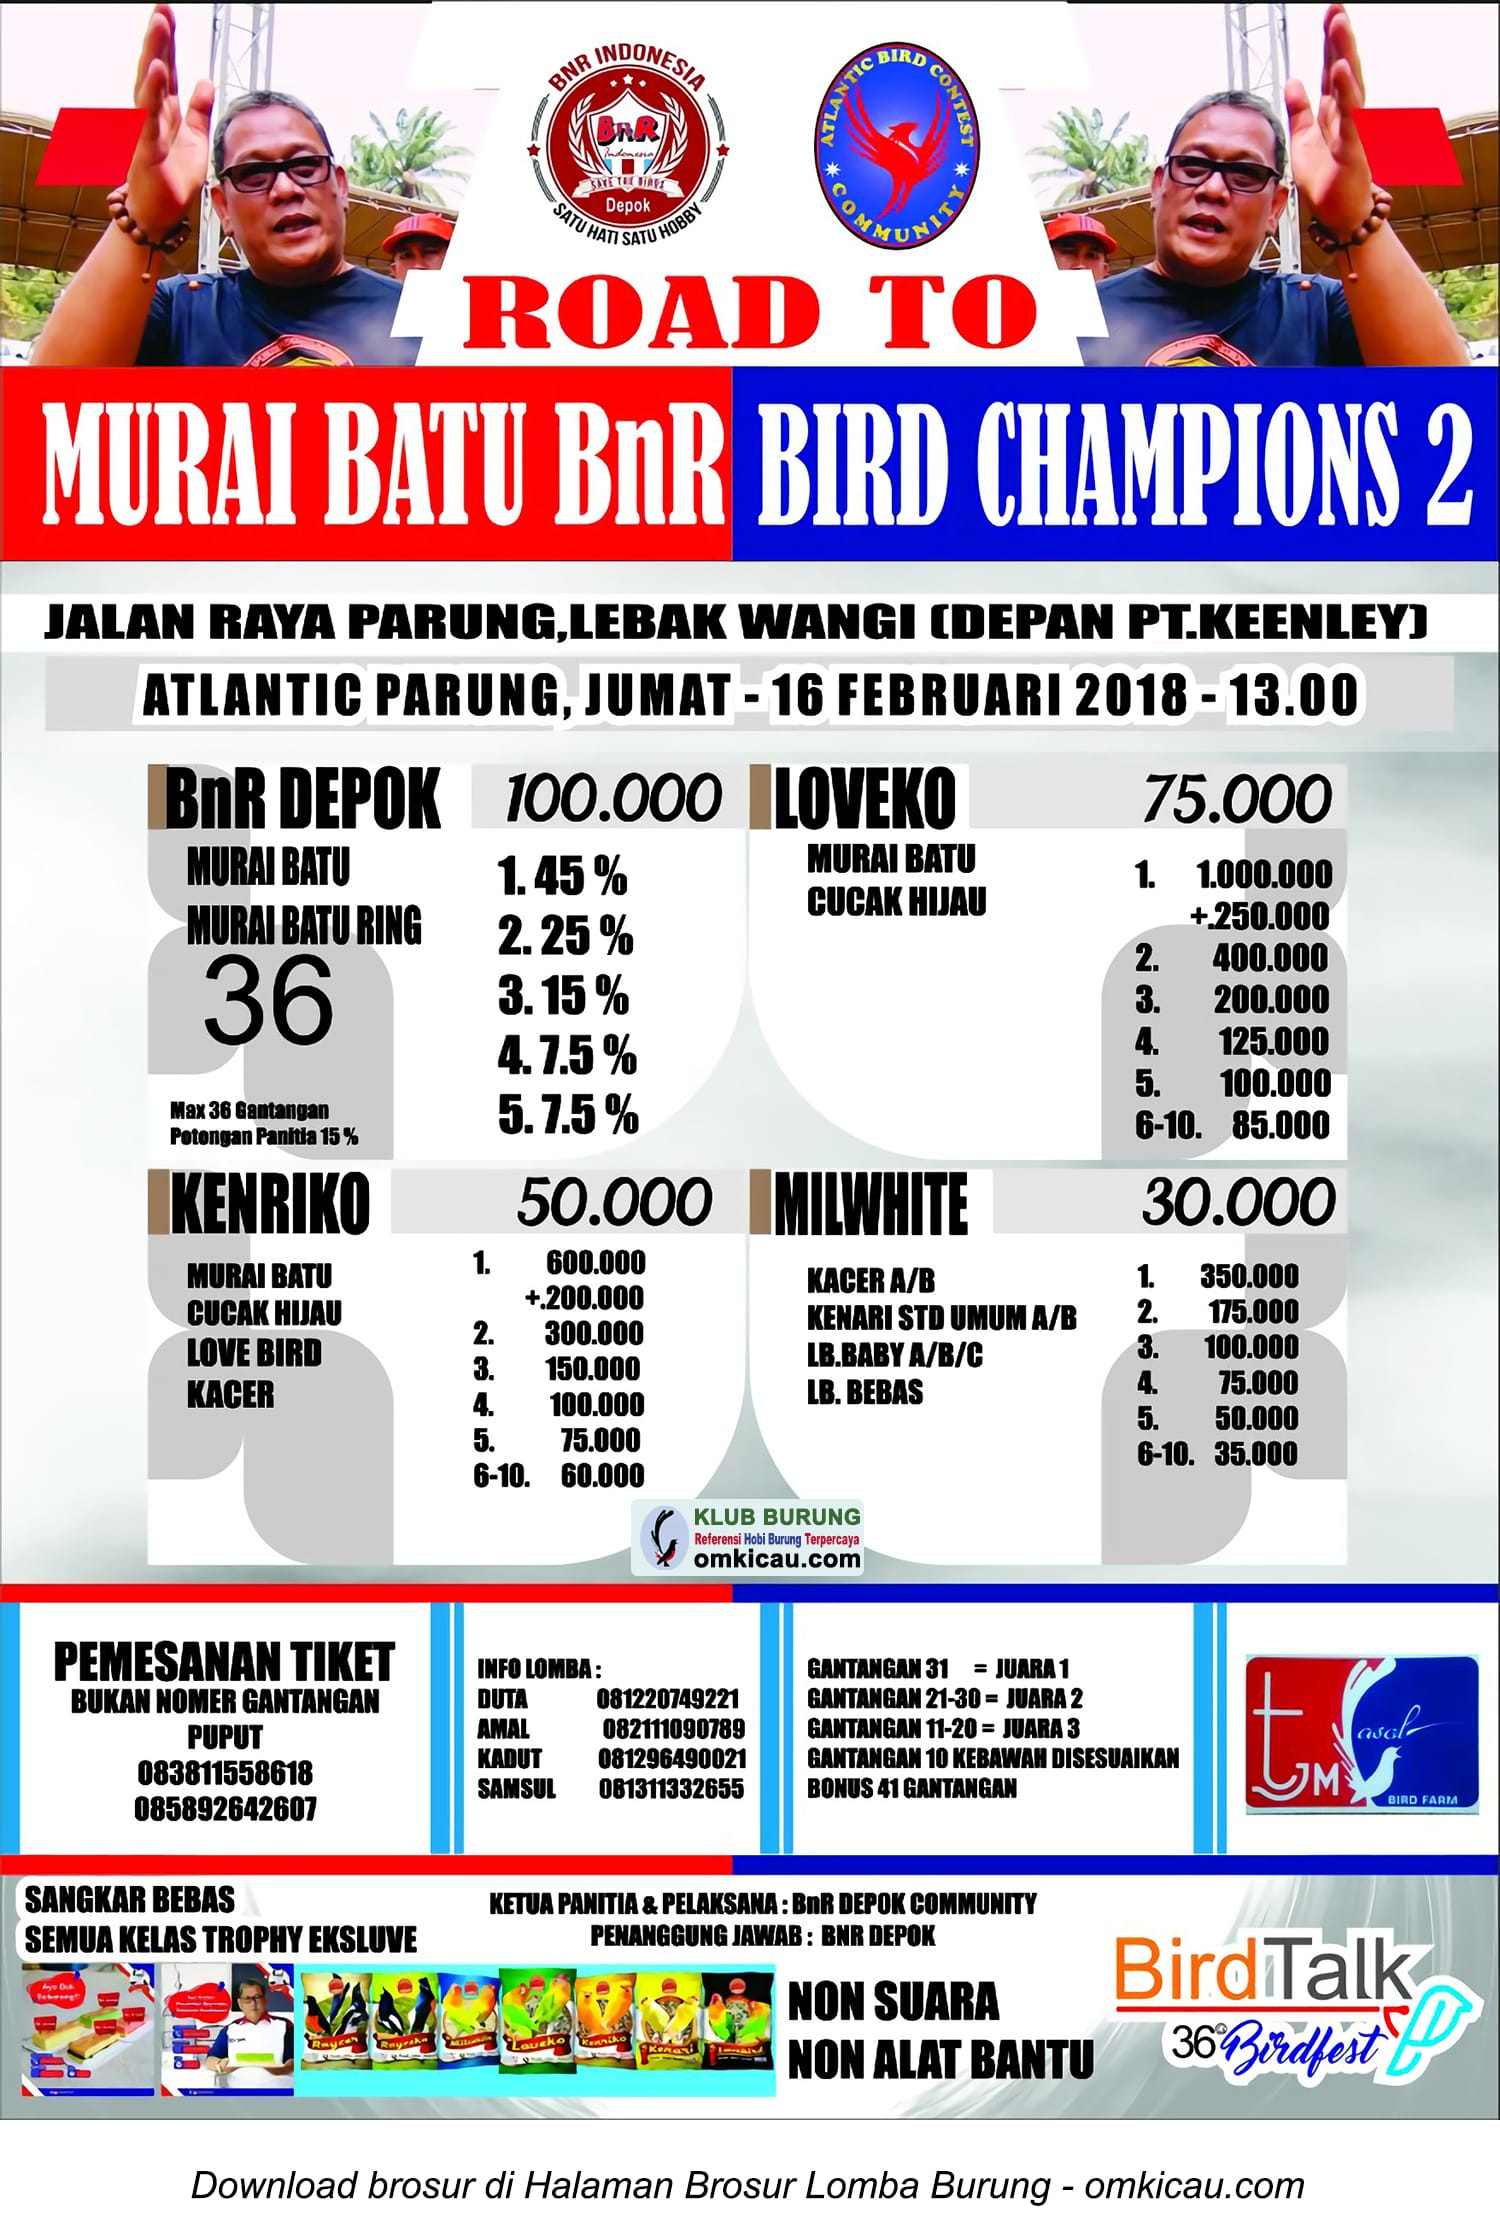 Road to Murai Batu BnR Award